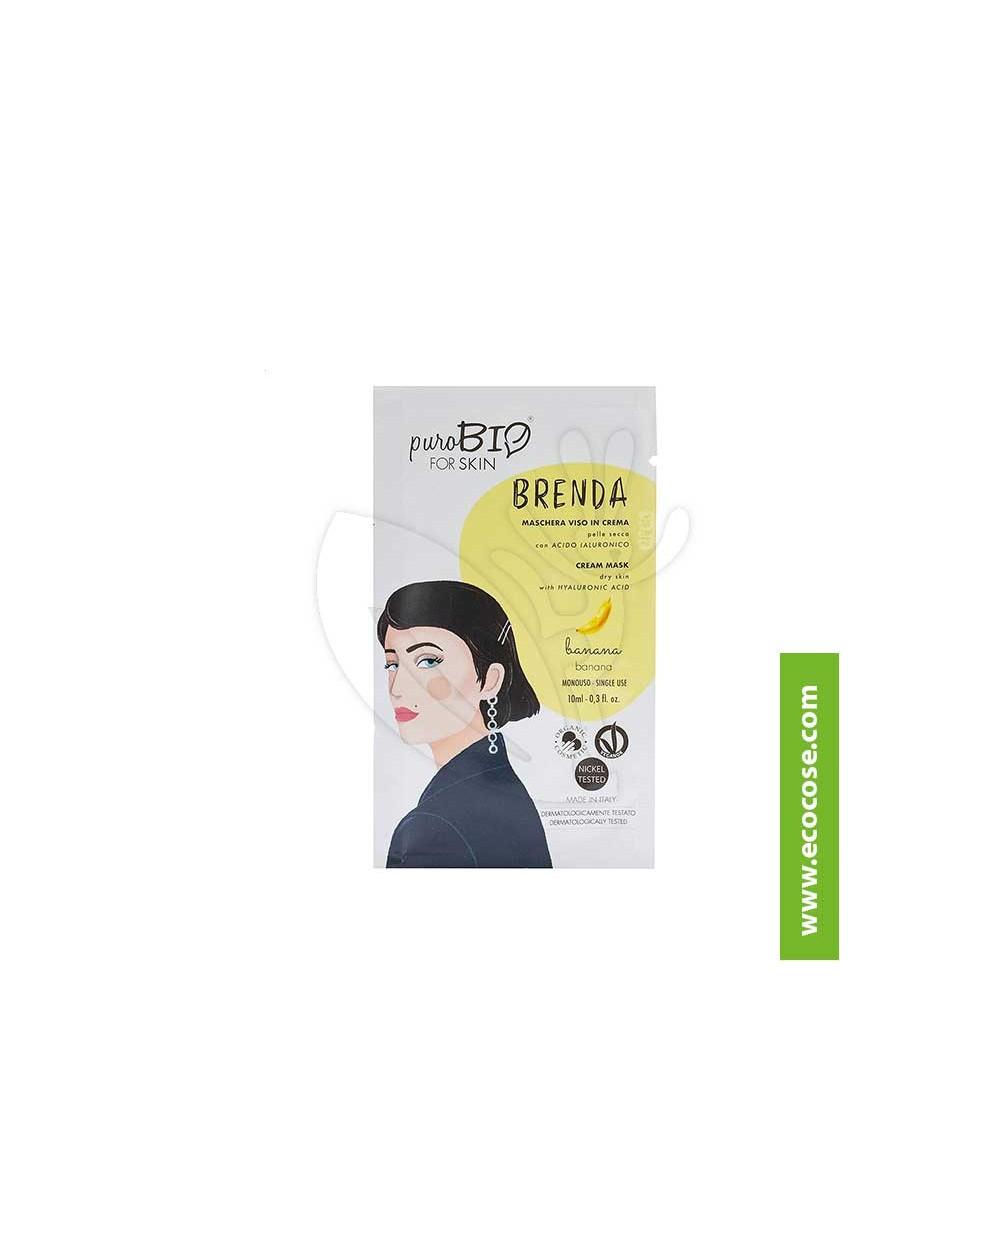 PuroBIO for skin - BRENDA - Maschera viso in crema - 02 Banana